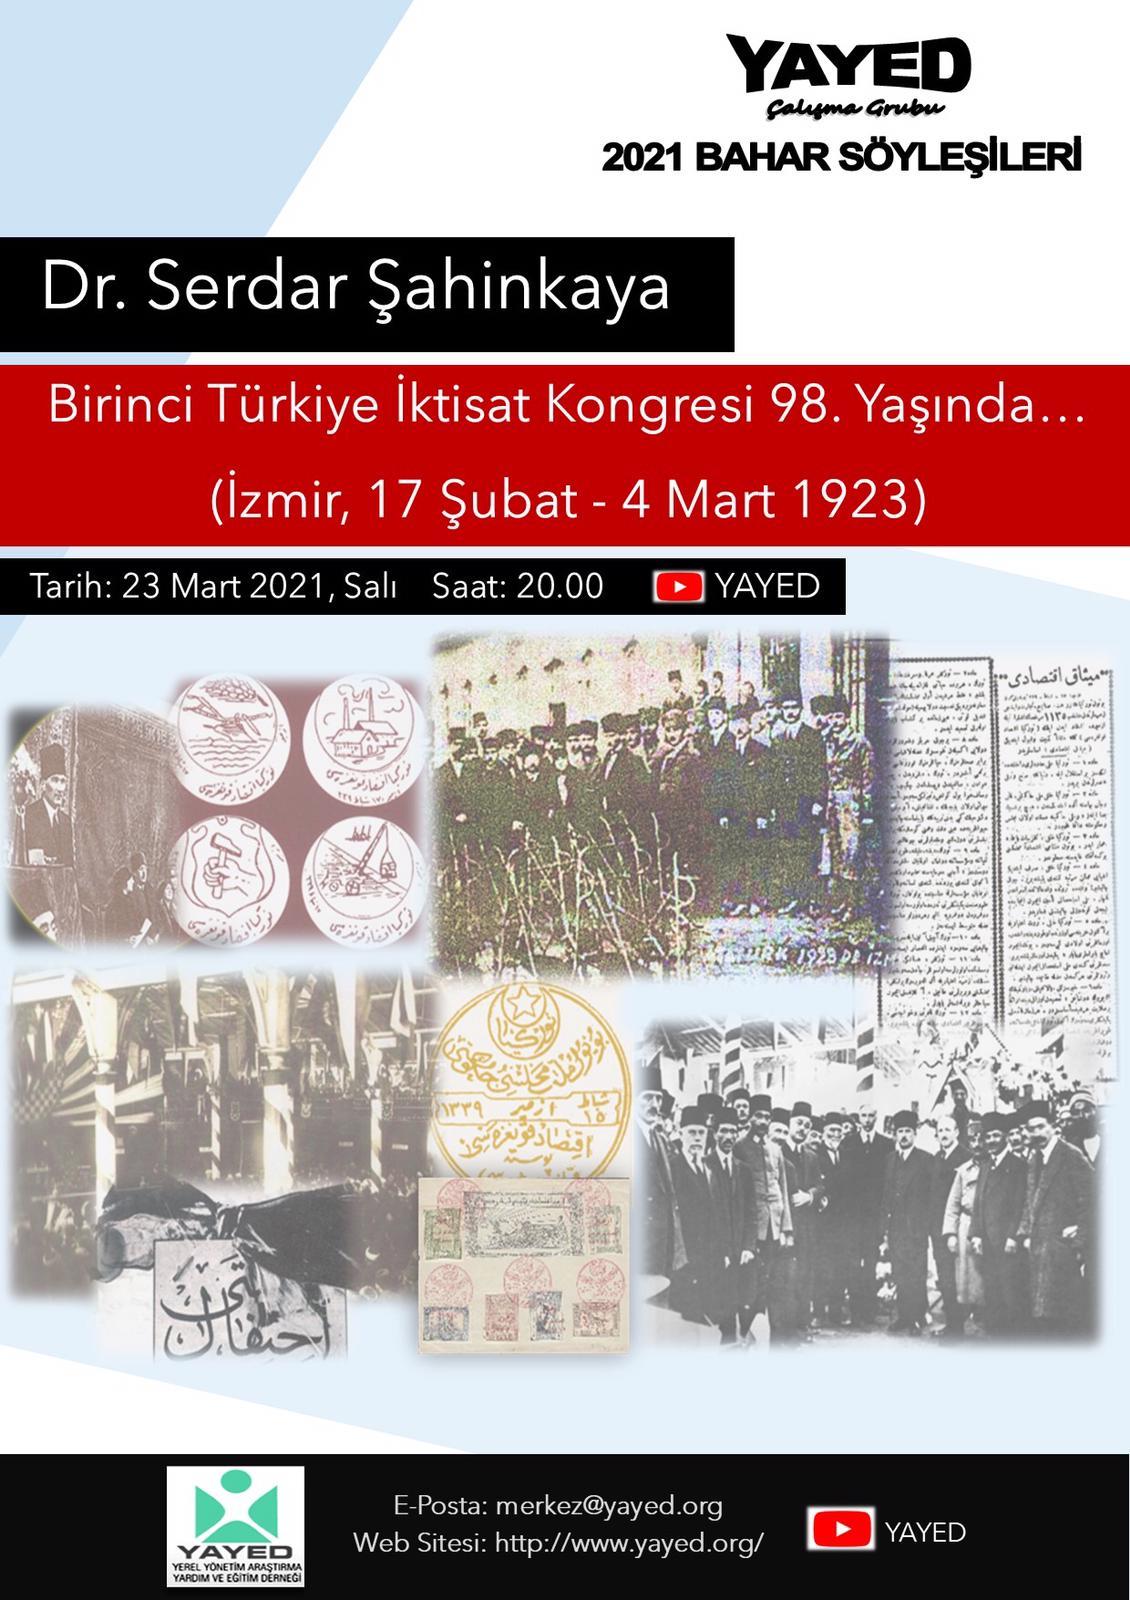 Dr. Serdar Şahinkaya